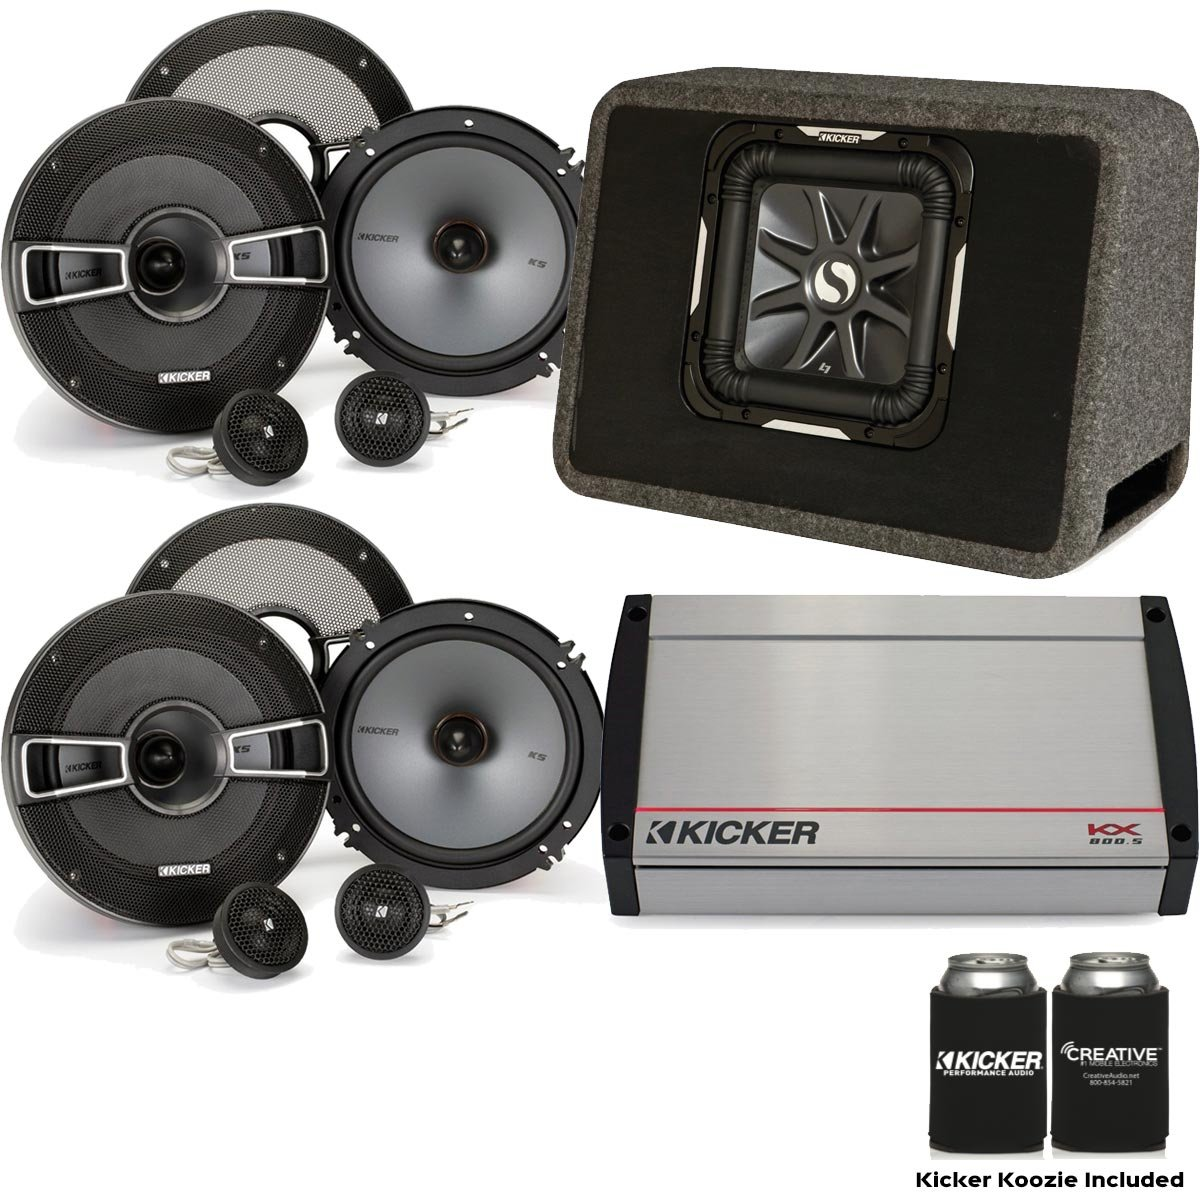 Kicker 40 kx8005 800ワット5-channel Amp、2つのペアのKS 6.5